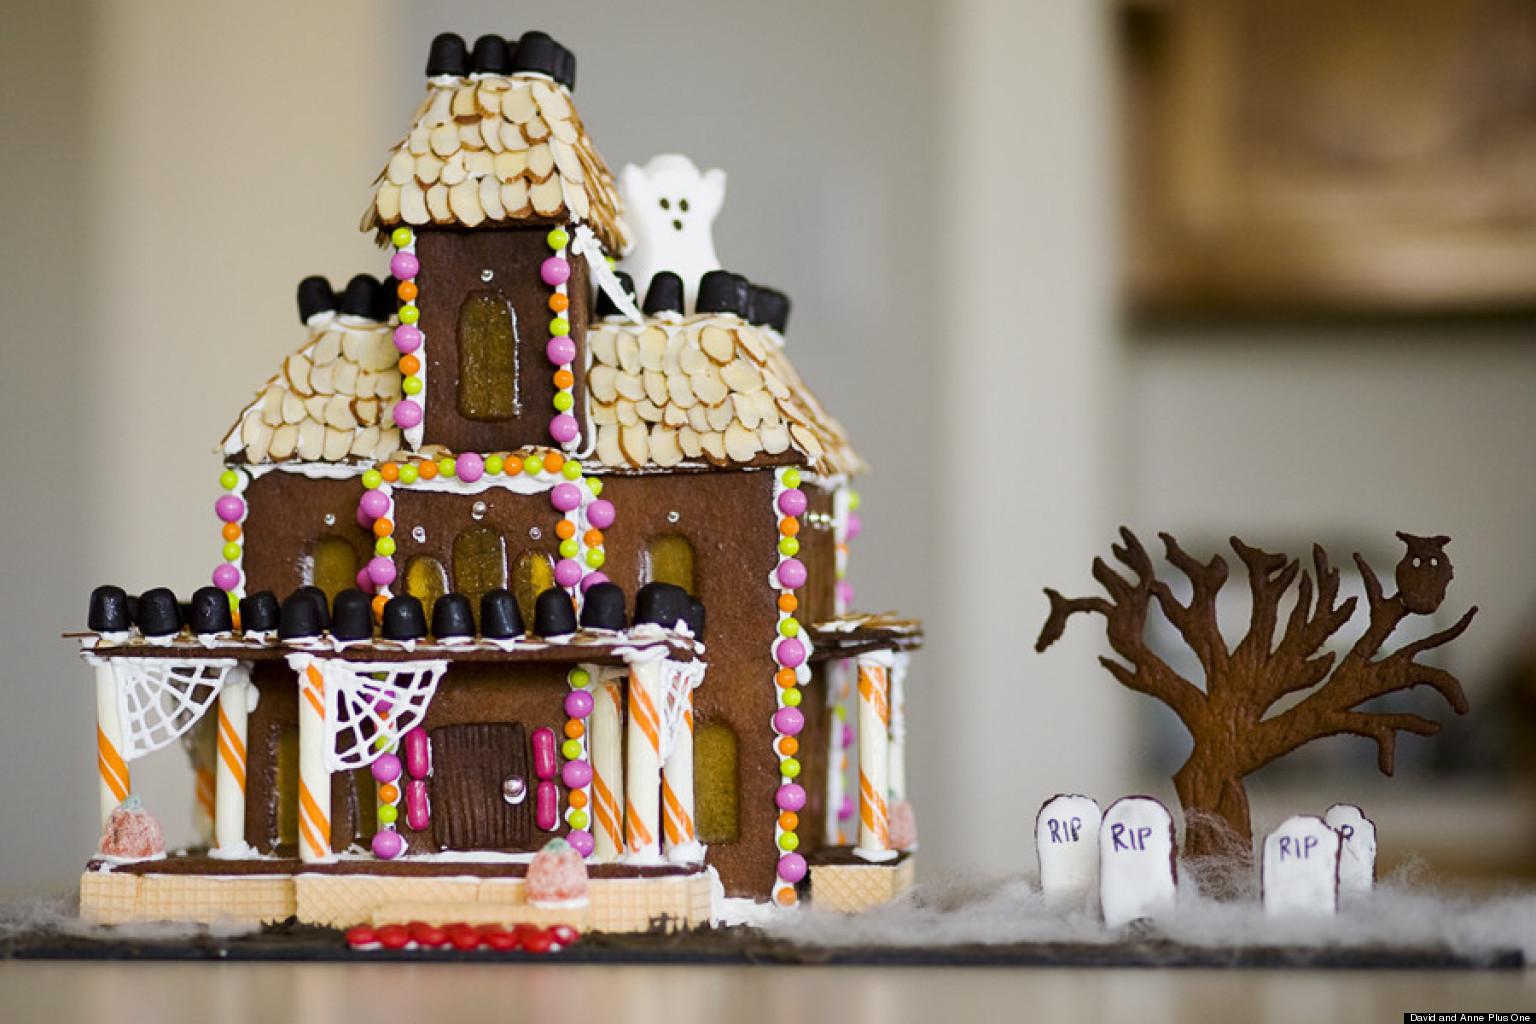 Haunted Gingerbread Houses Eerie Halloween Creations PHOTOS